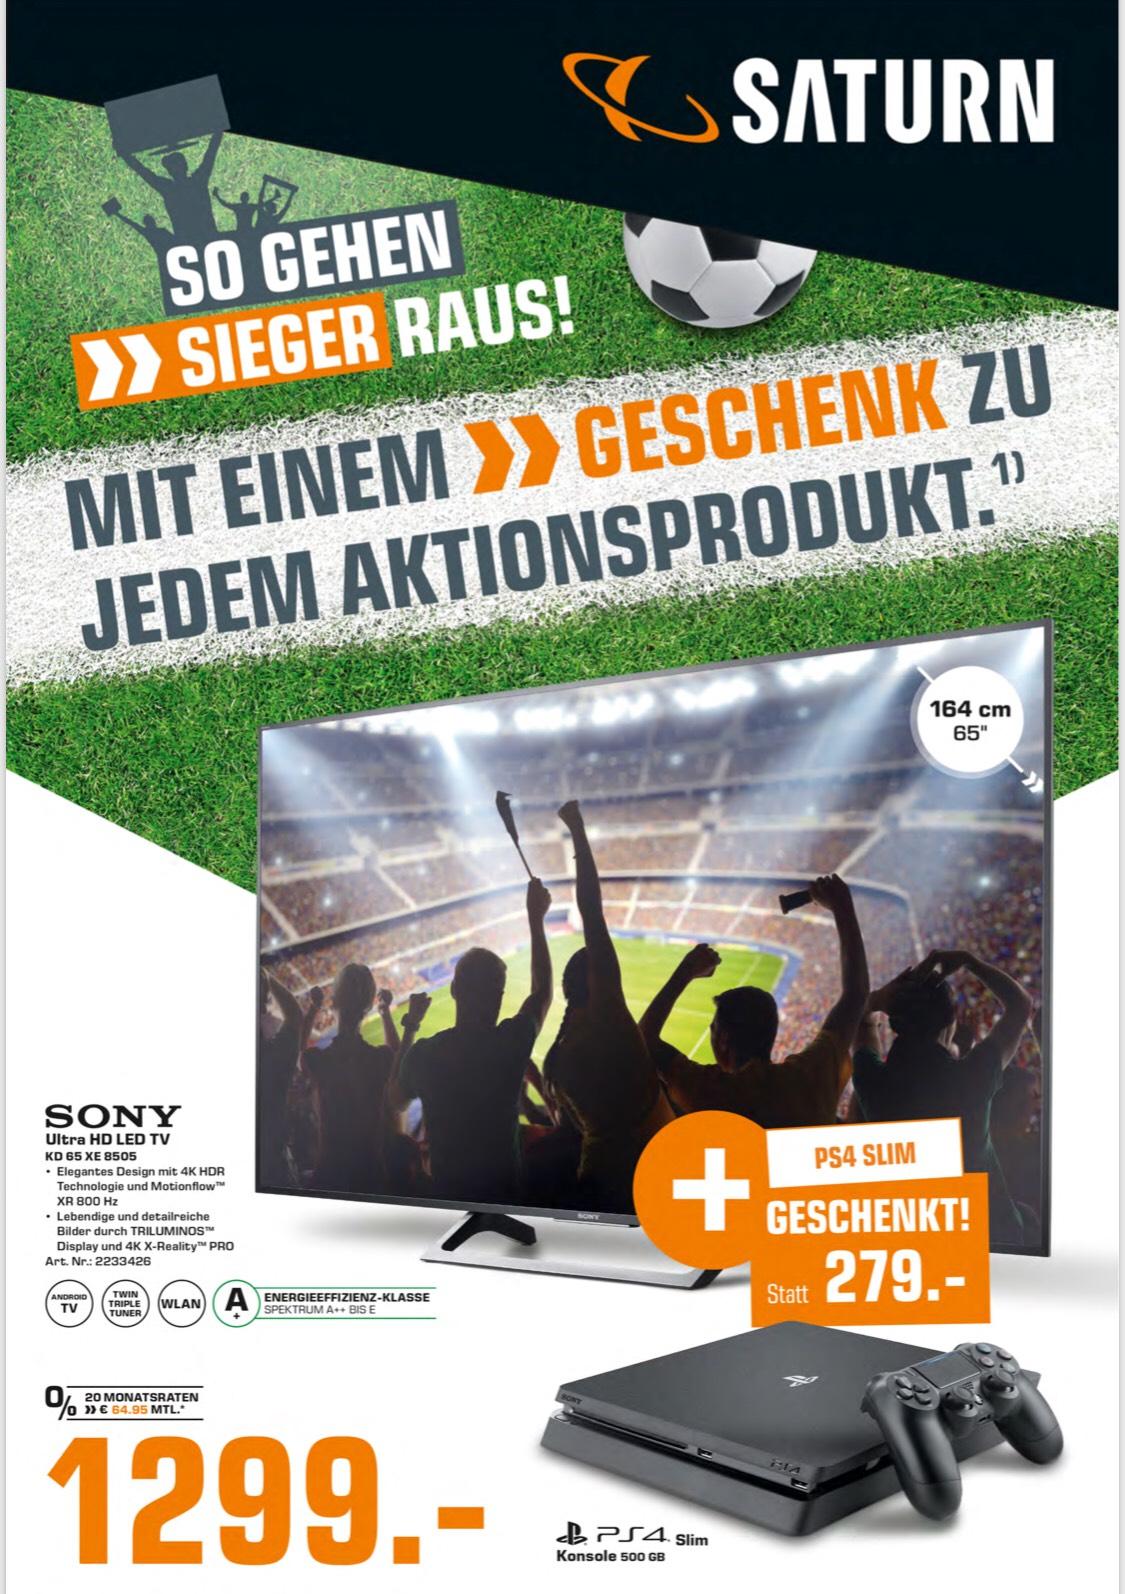 65XE8505 für 1299€ inkl. PS4 (236€ EBay) PVG. 1299€ Ohne